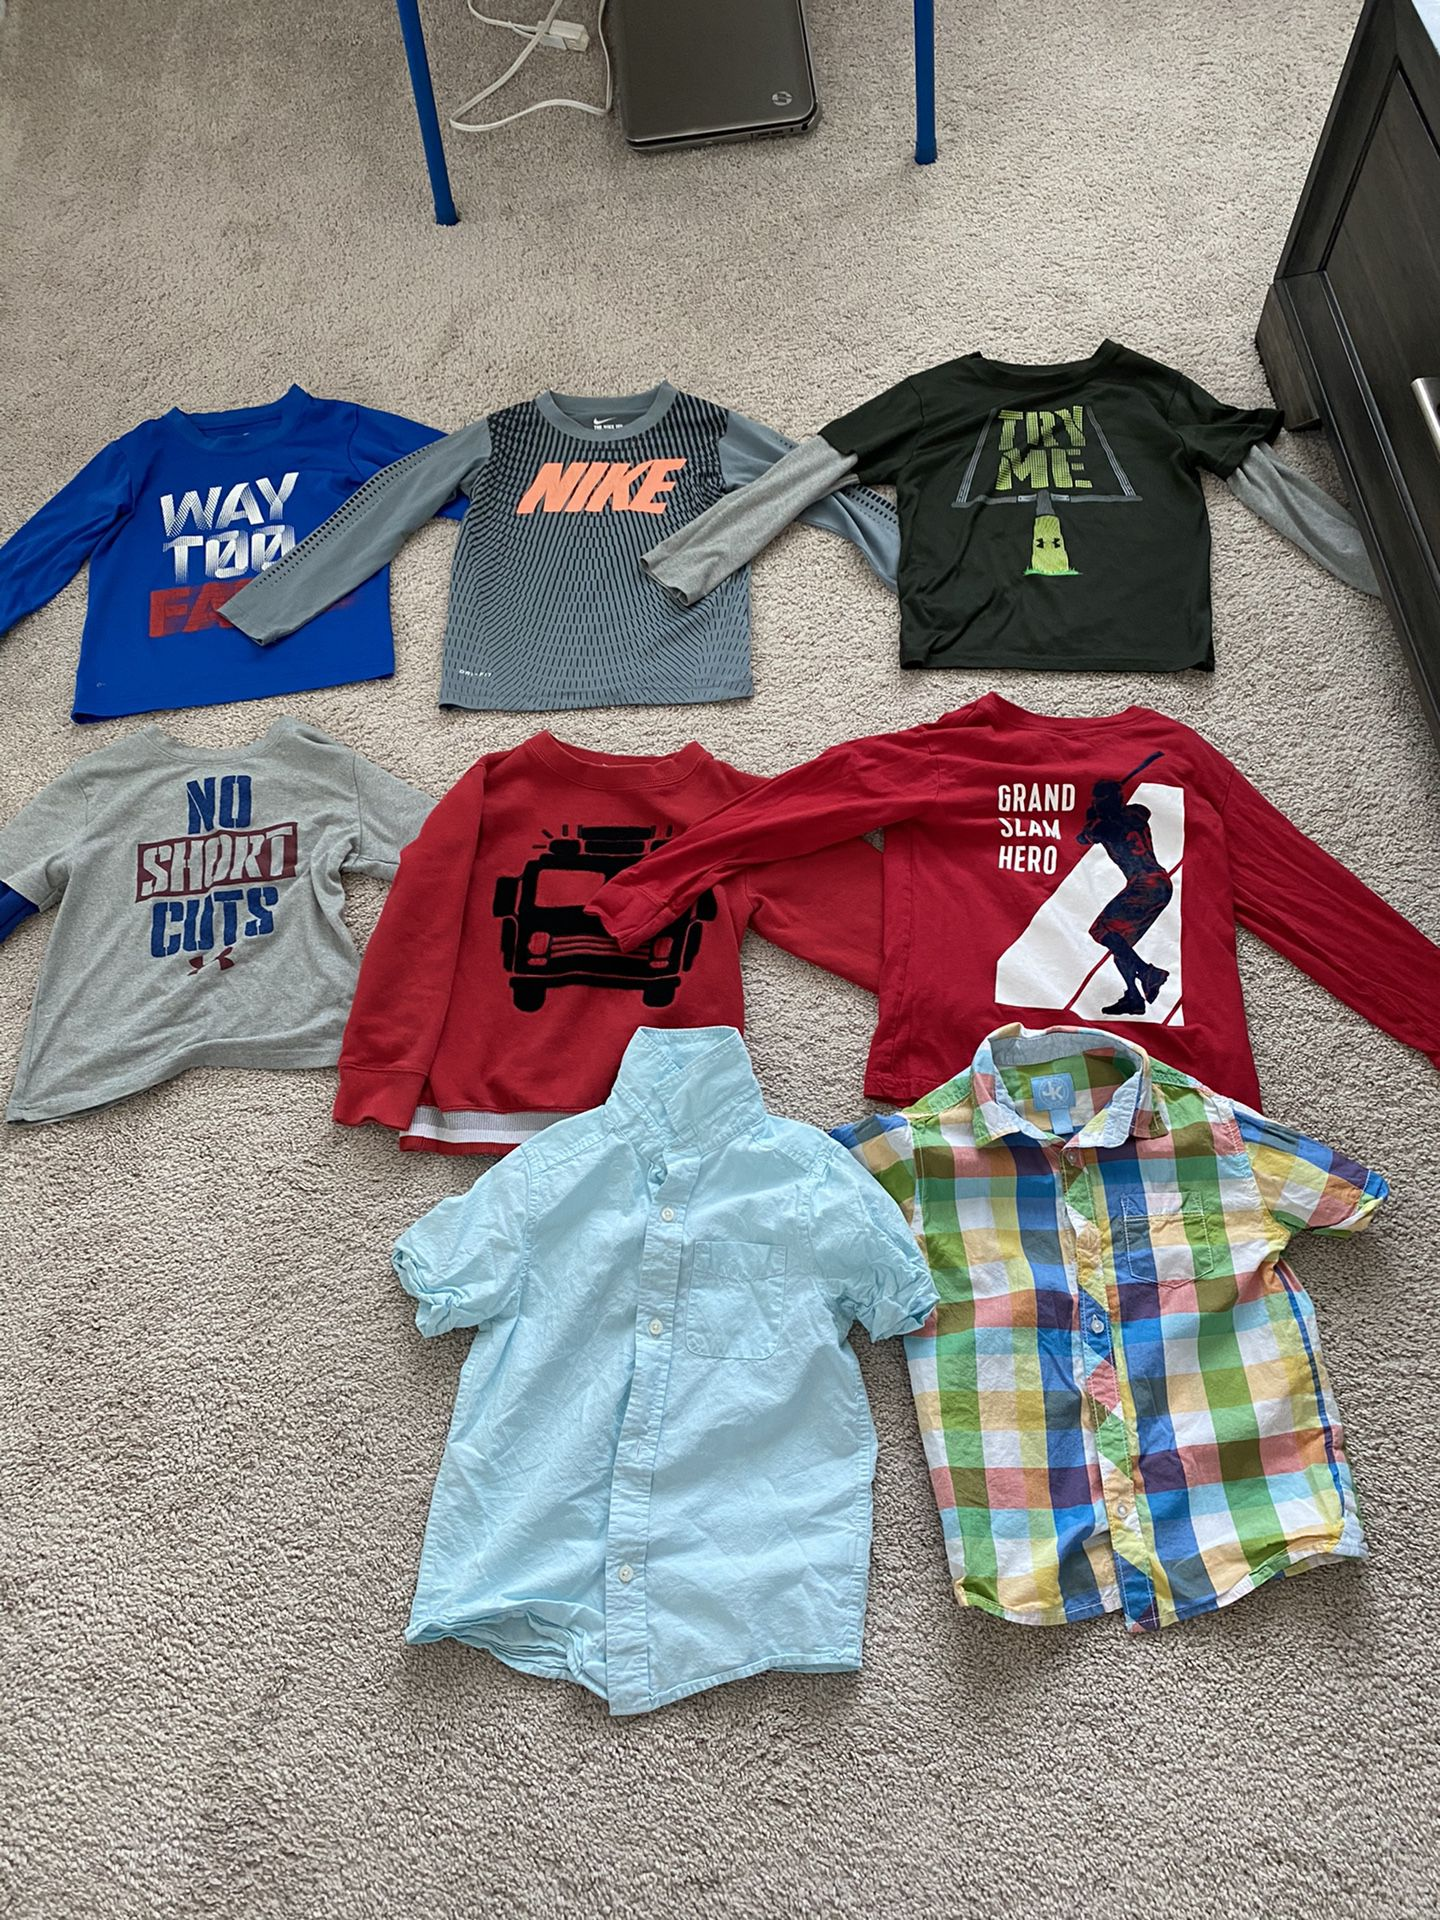 Boy Clothes(size-5)